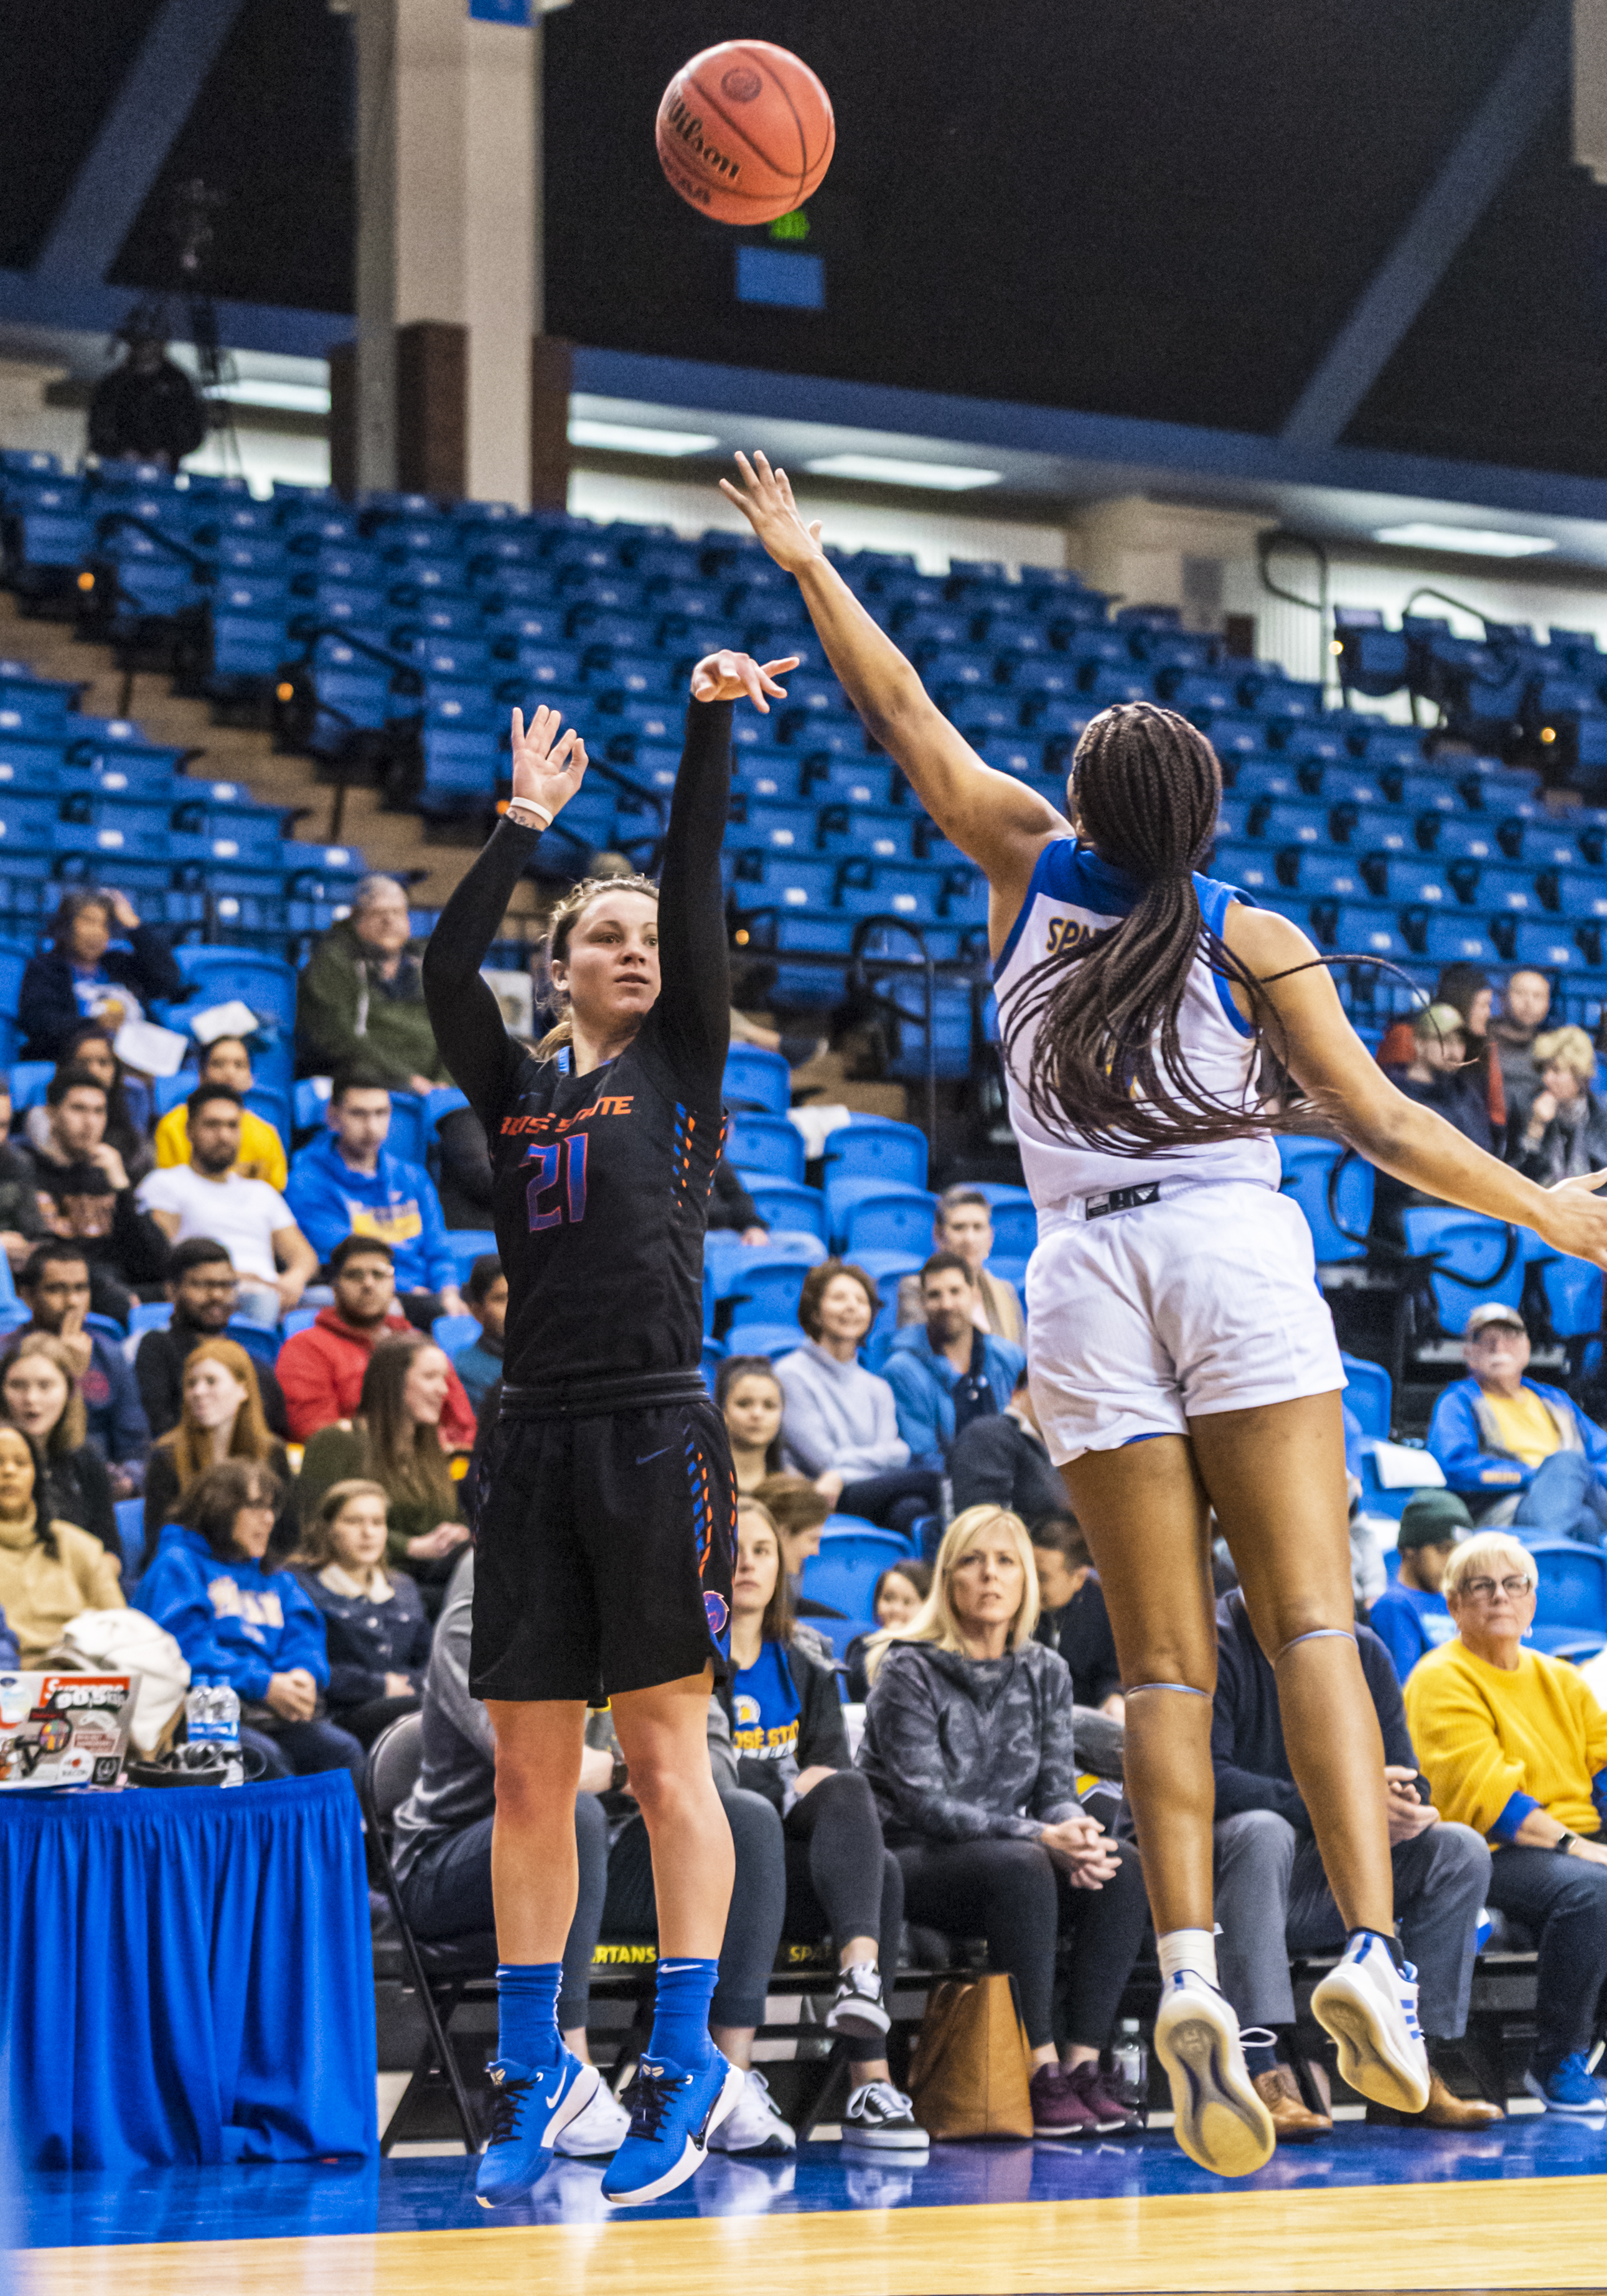 COLLEGE BASKETBALL: JAN 29 Women's Boise State at San Jose State